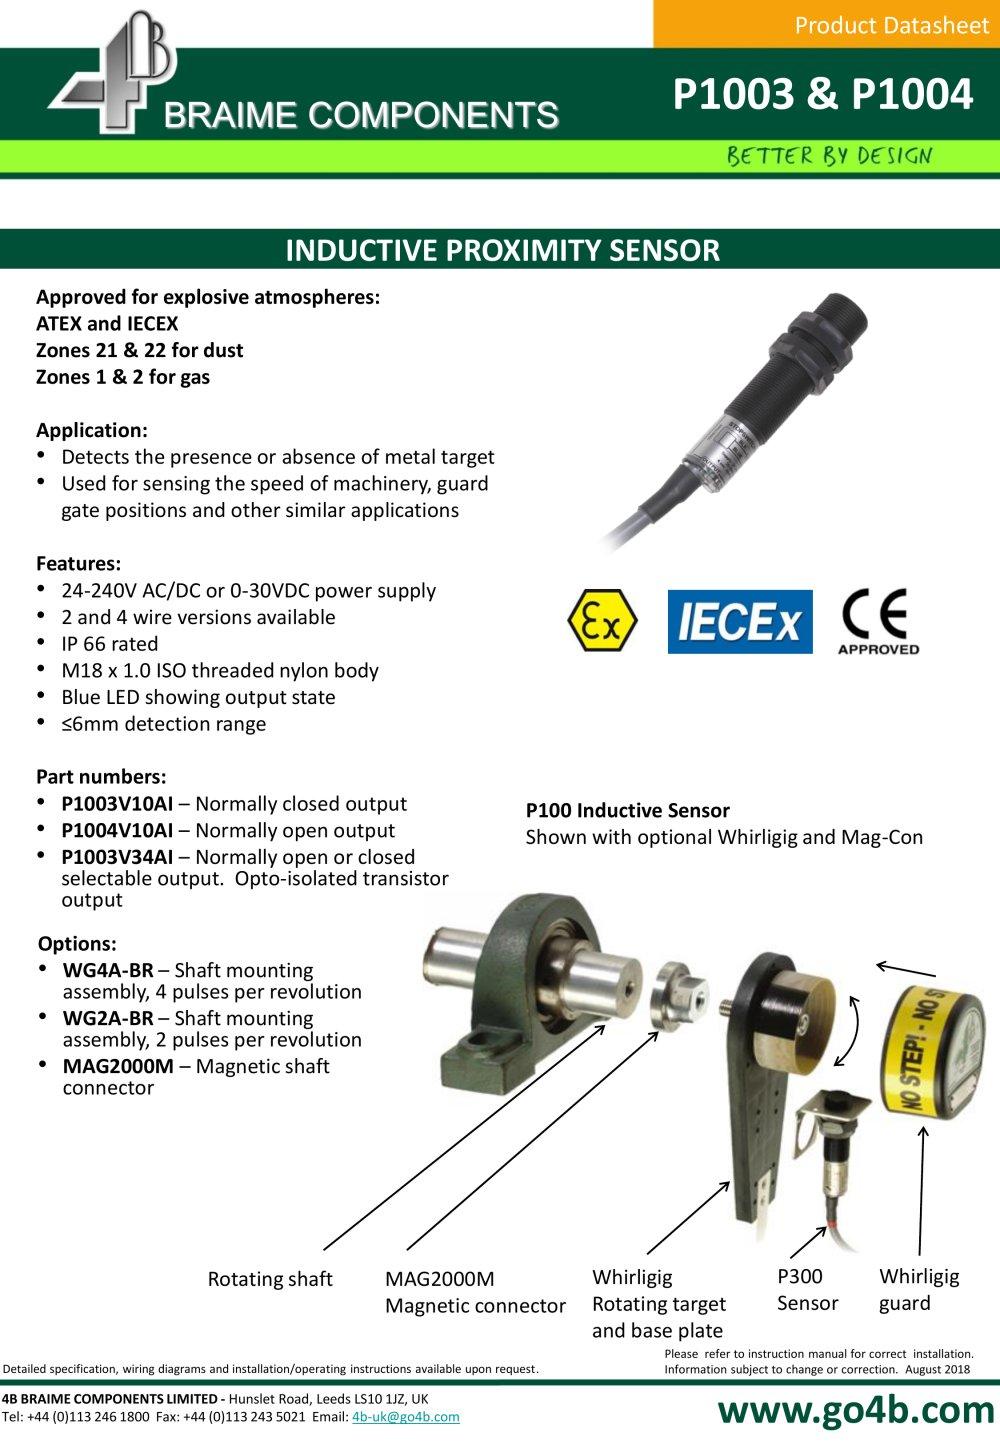 hight resolution of p1003 and p1004 18mm inductive proximity sensor 4b braime cat 3 wiring diagram ac inductive proximity